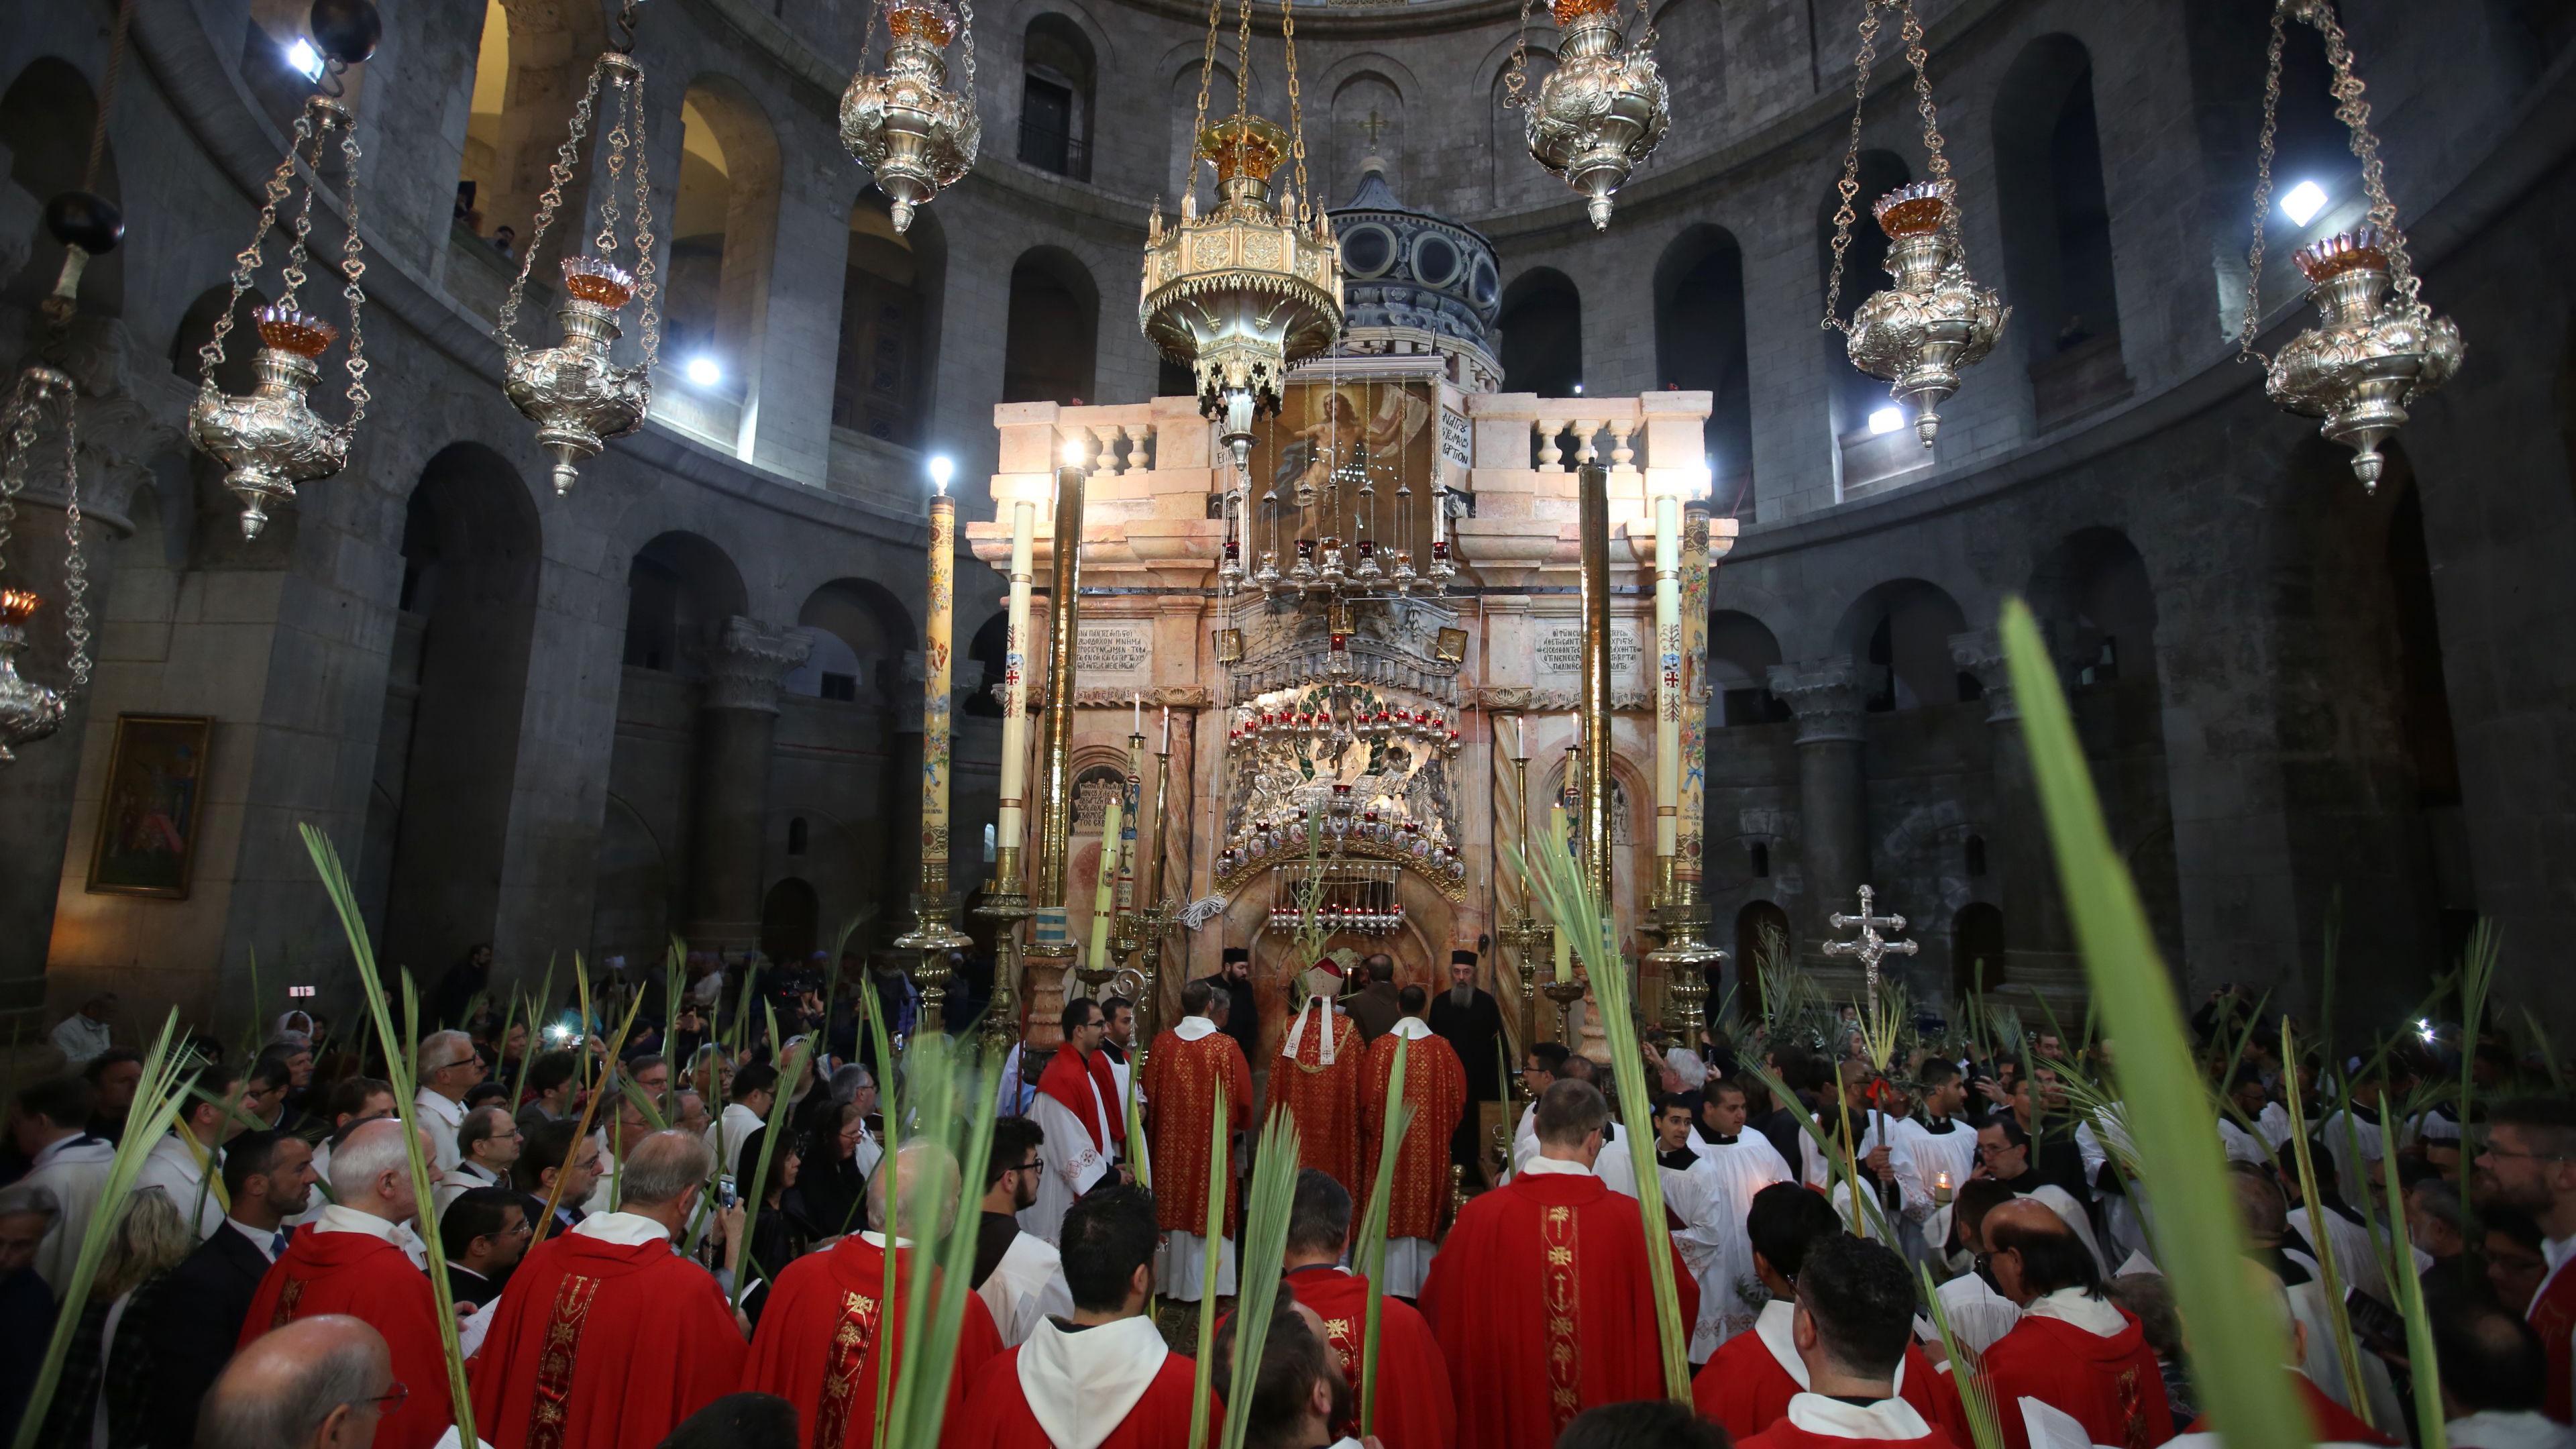 What do Christians celebrate on Palm Sunday?